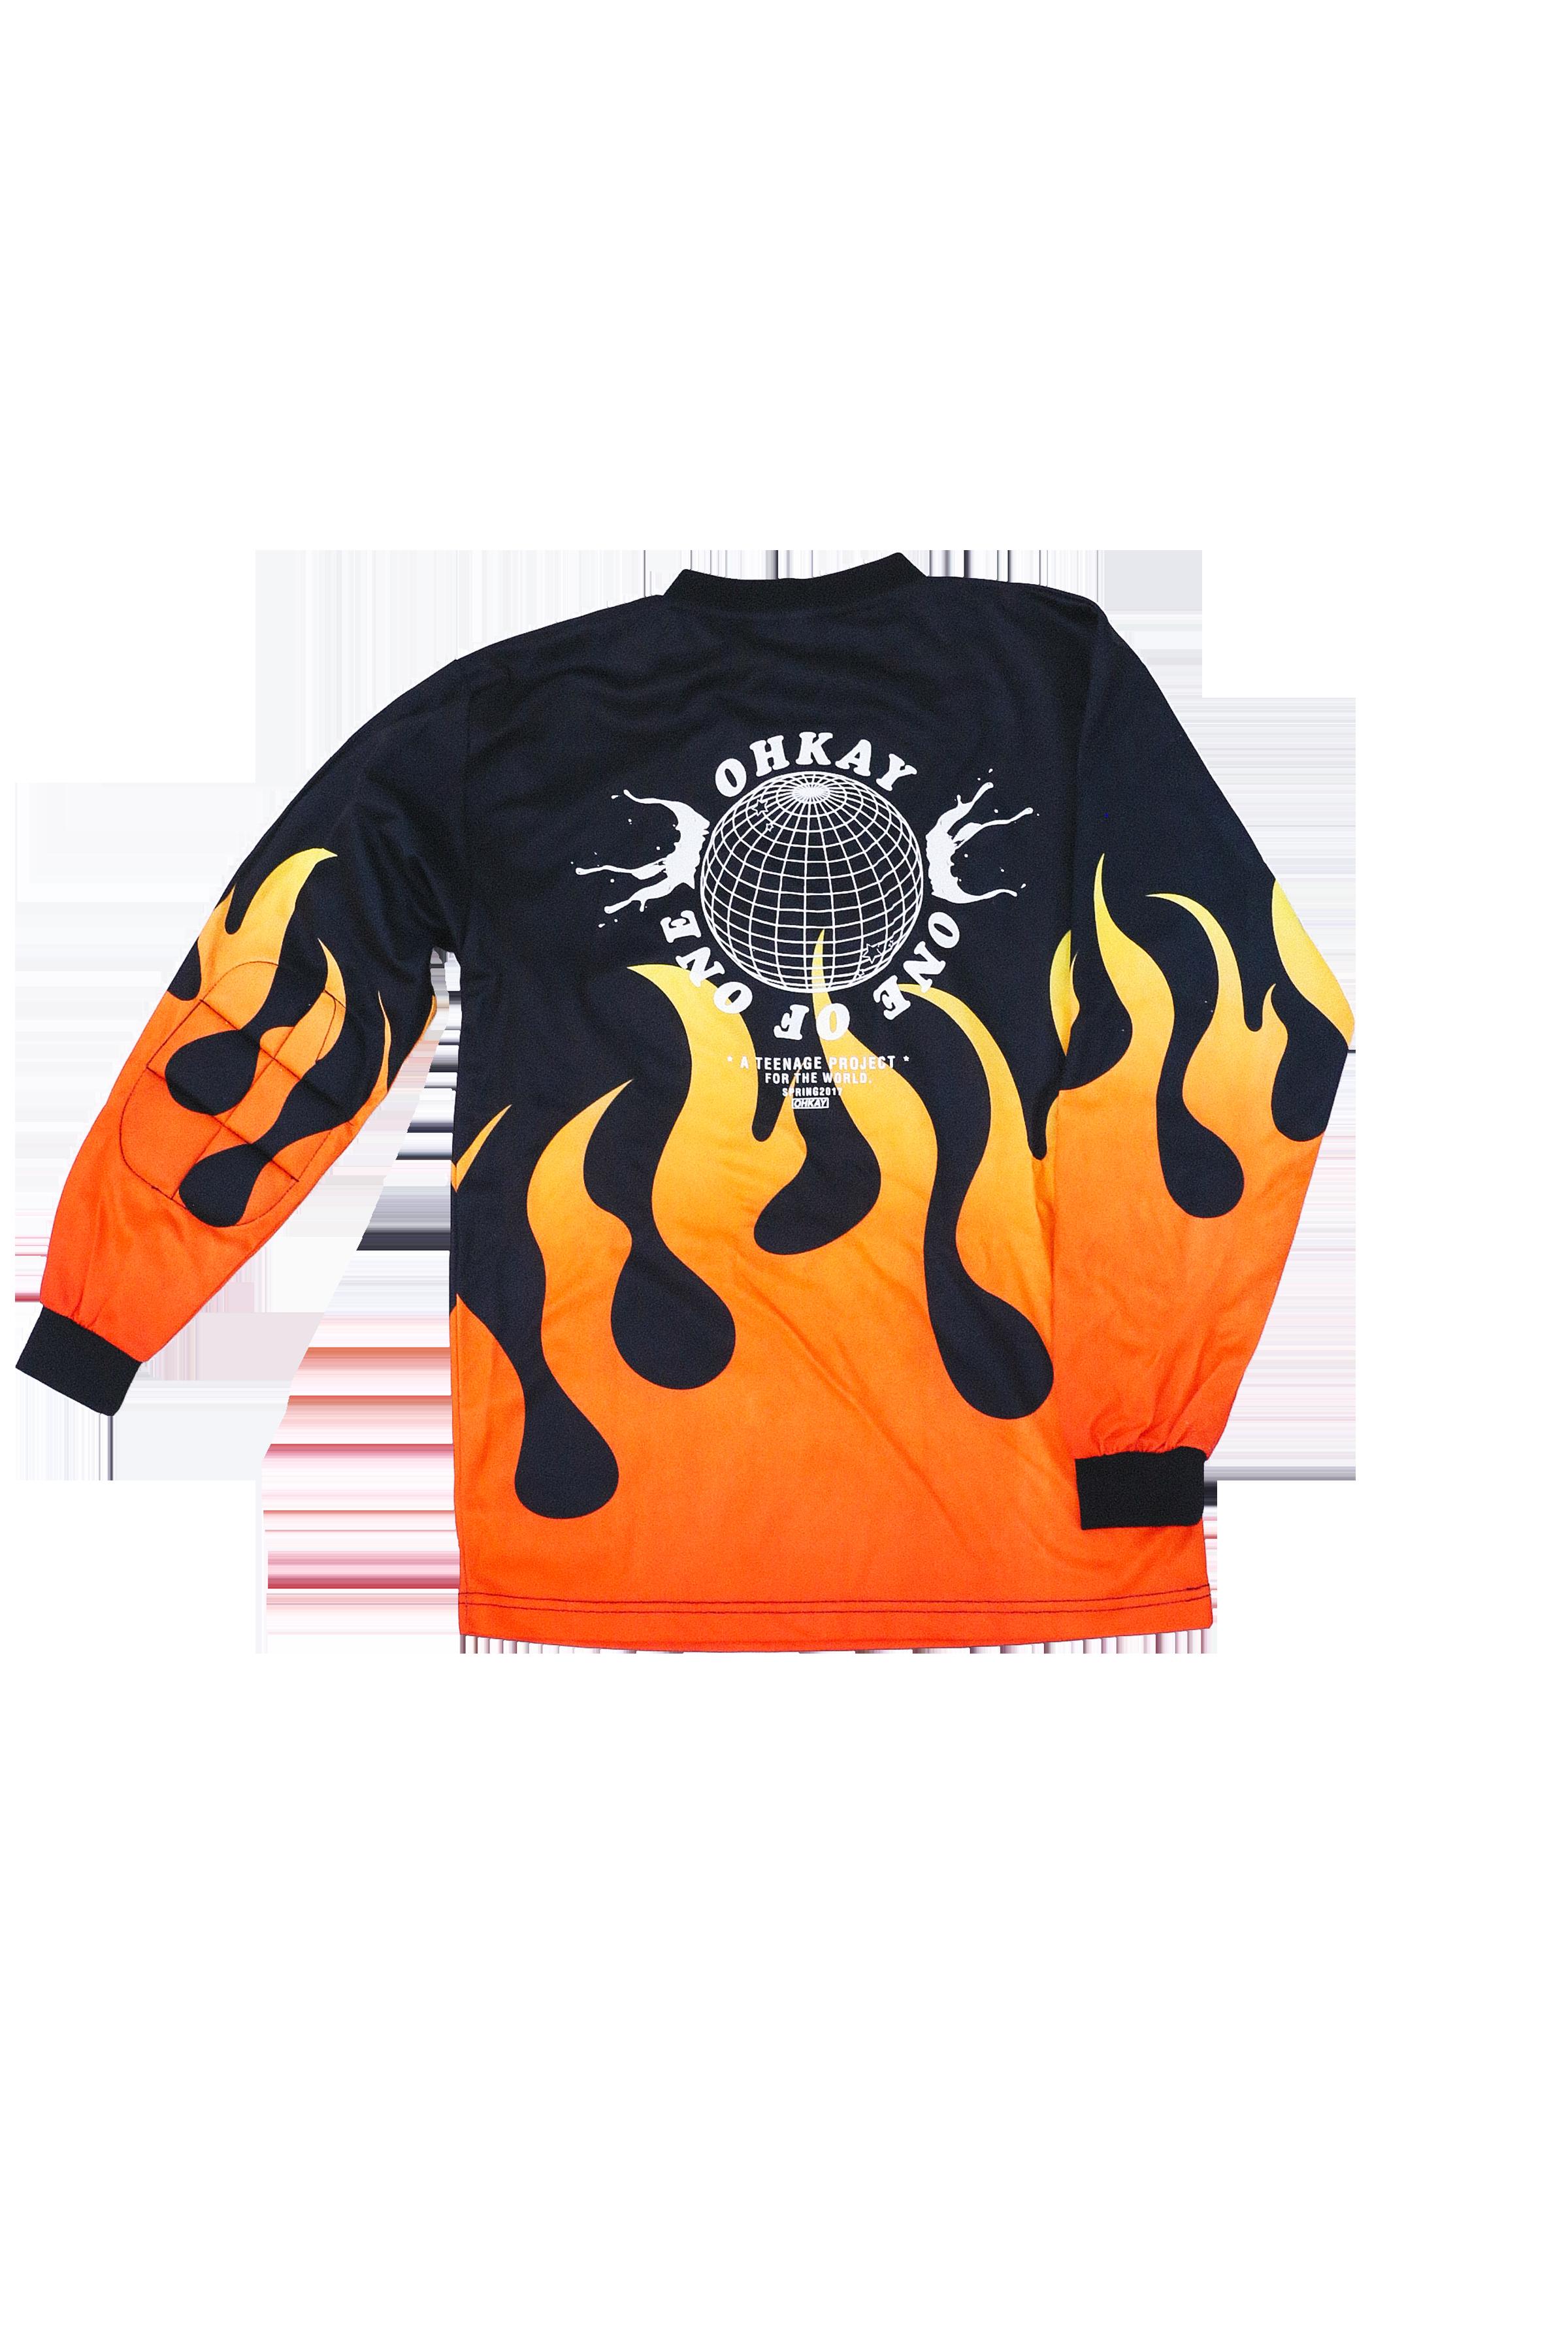 flame shirt back.png